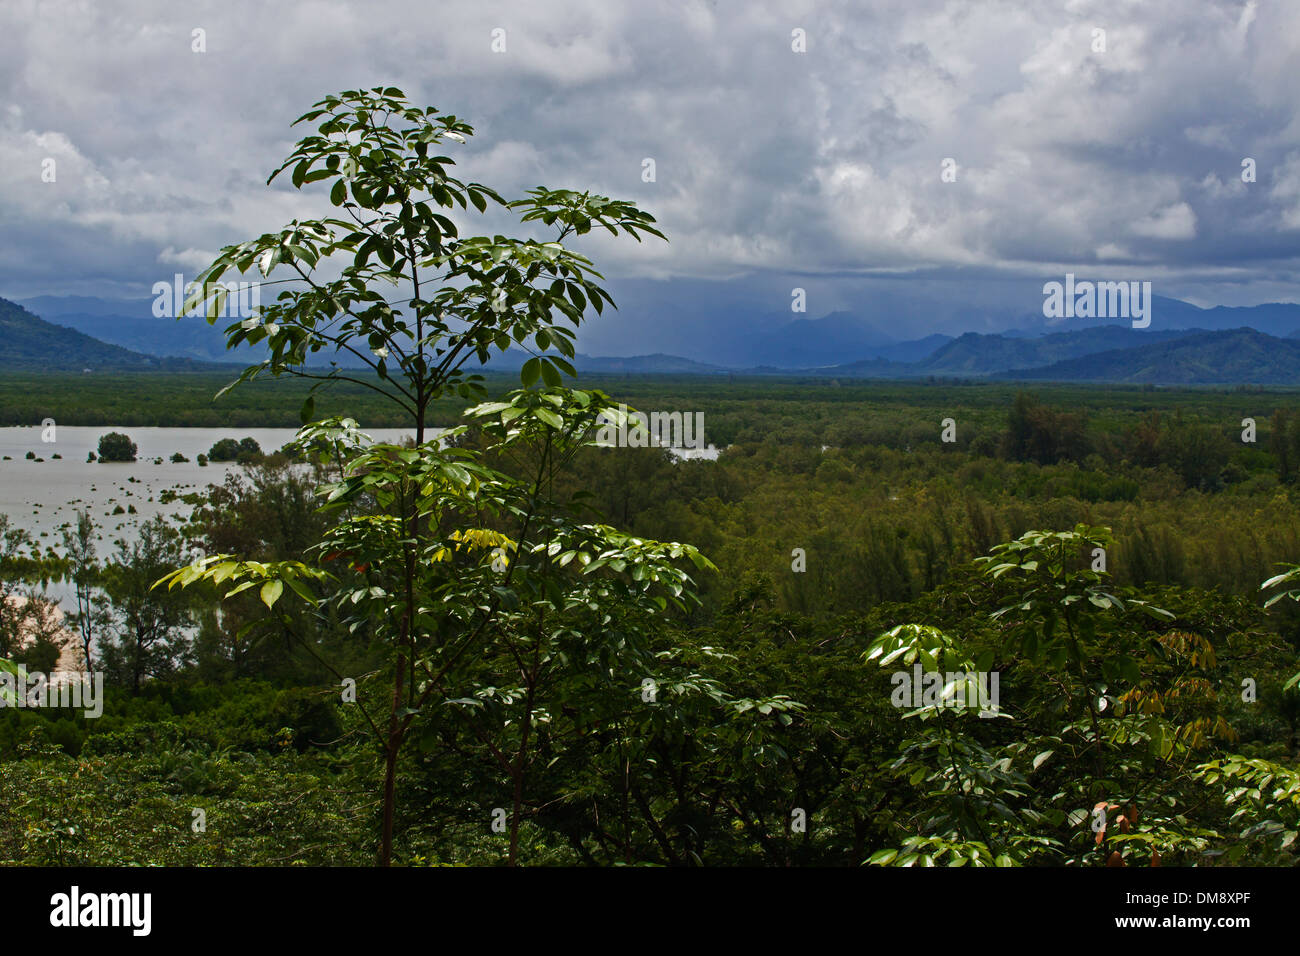 MANGROVE ECOSYSTEM near the ANDAMAN SEA - SOUTHERN THAILAND - Stock Image